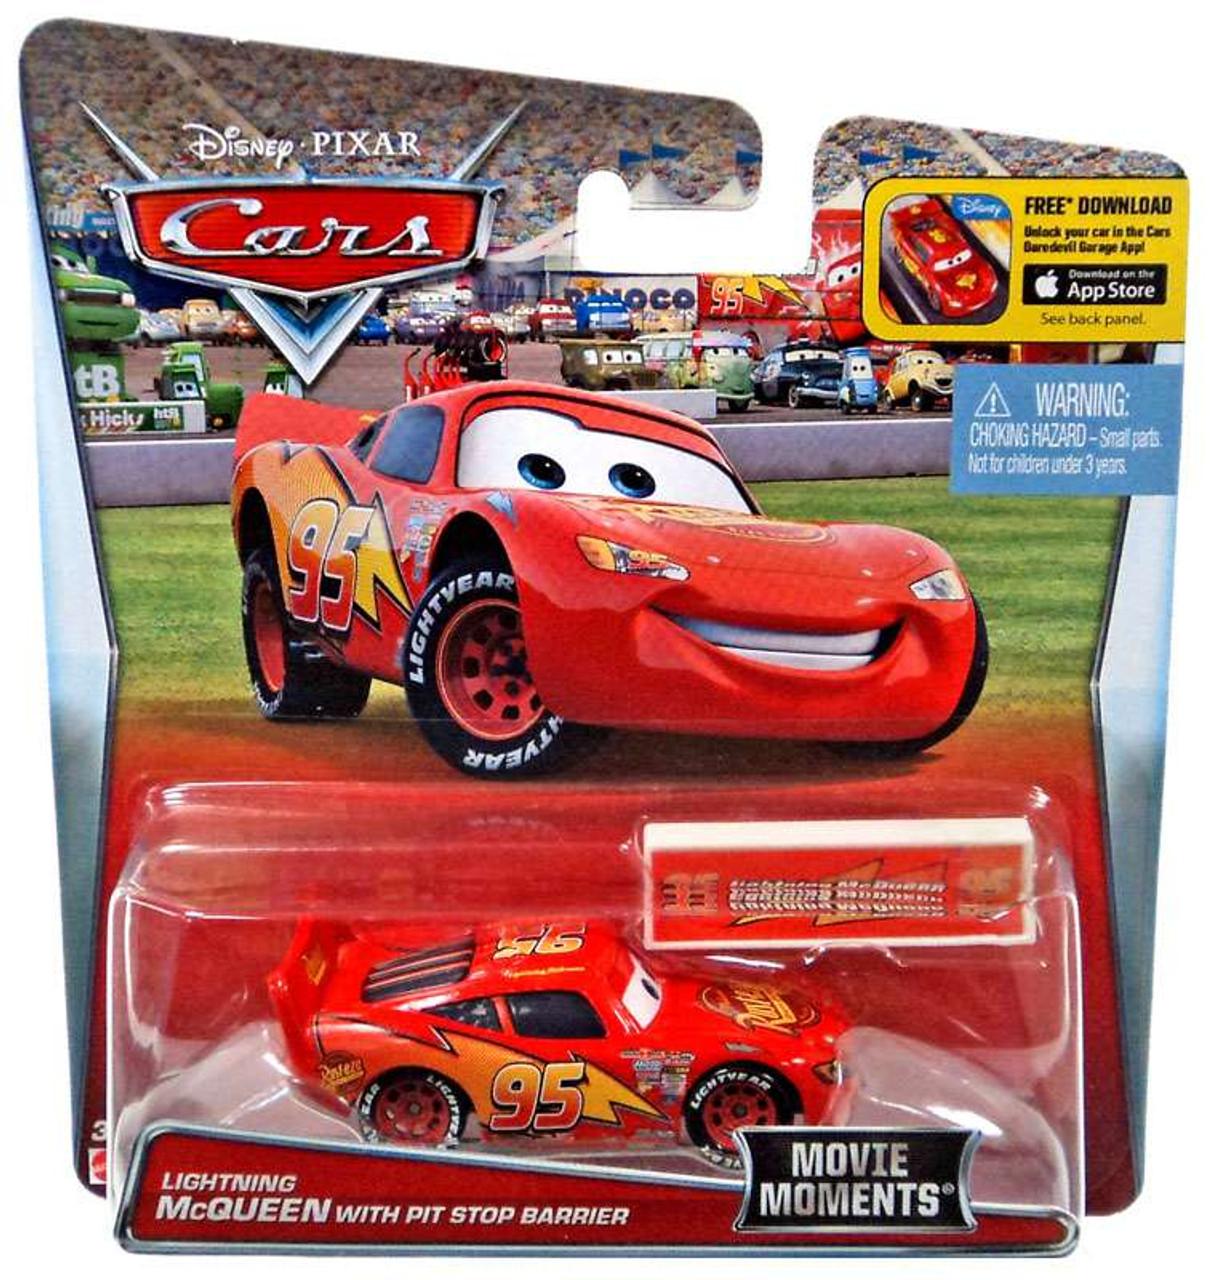 Disney Pixar Cars Movie Moments Lightning Mcqueen 155 Diecast Car